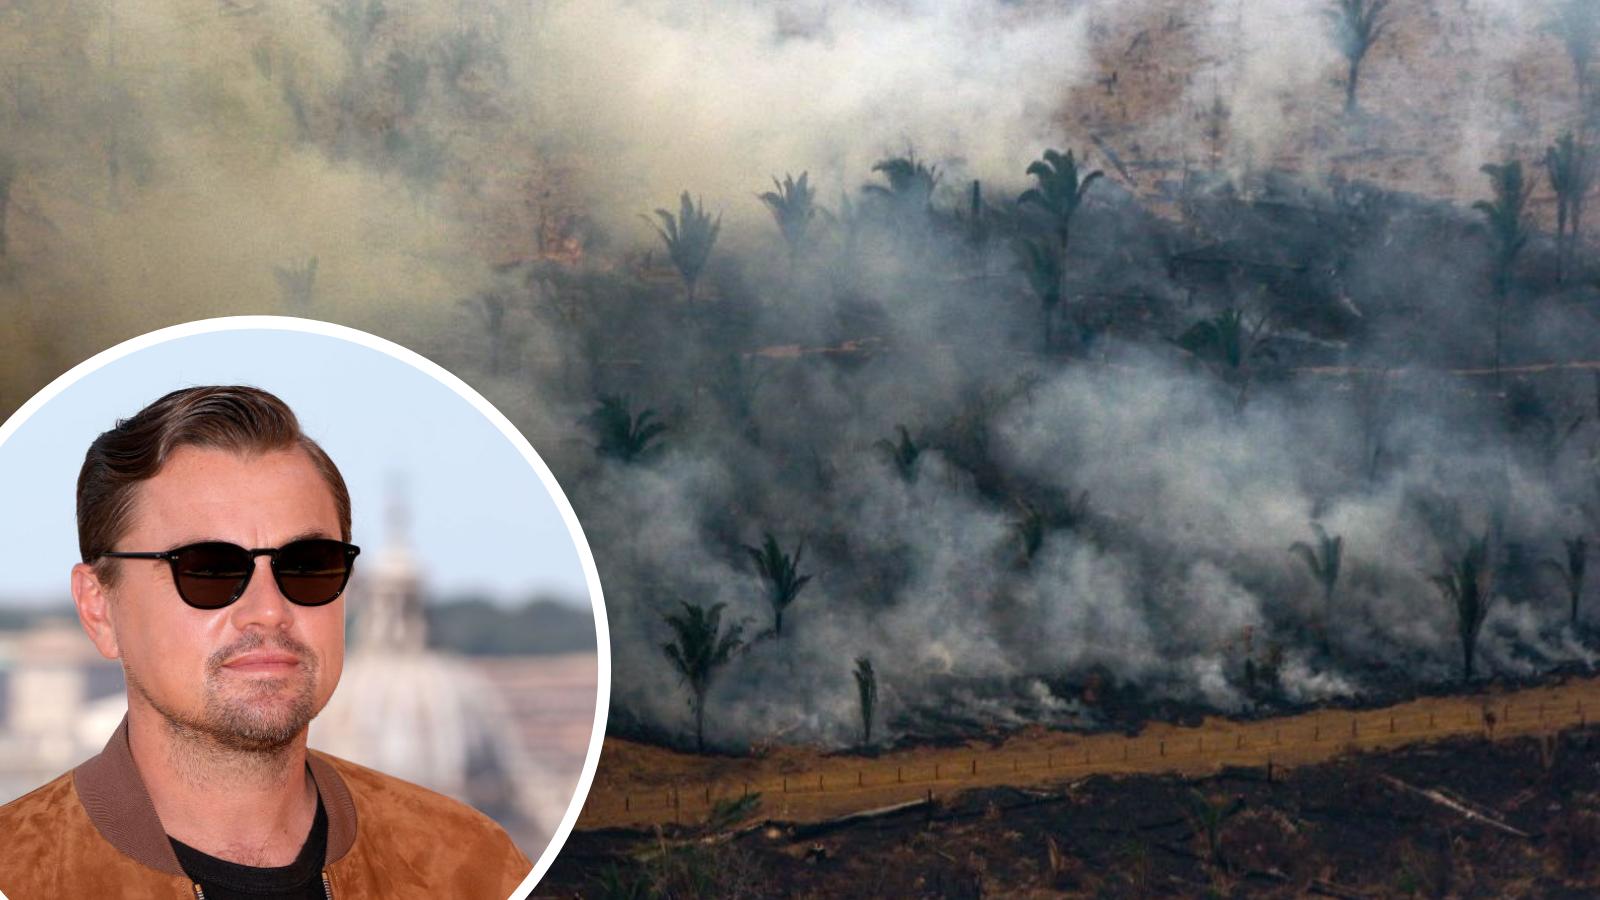 Leonardo DiCaprio's climate change fund pledges $7.4 million to save the Amazon